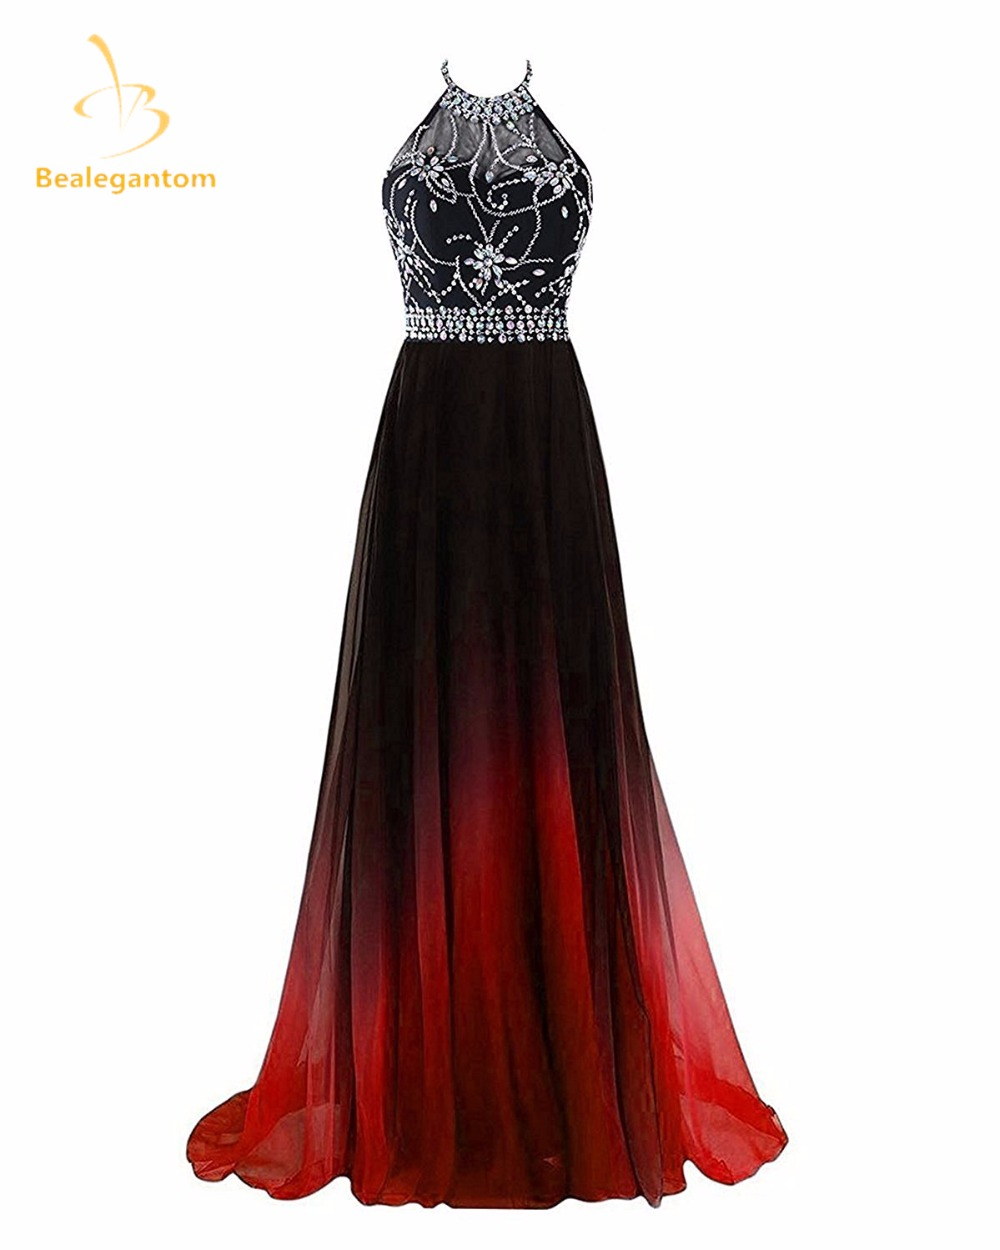 Bealegantom Halter Gradient Prom Dresses 2019 With Long Chiffon Plus Size Ombre Evening Party Gowns Vestido Longo QA1231